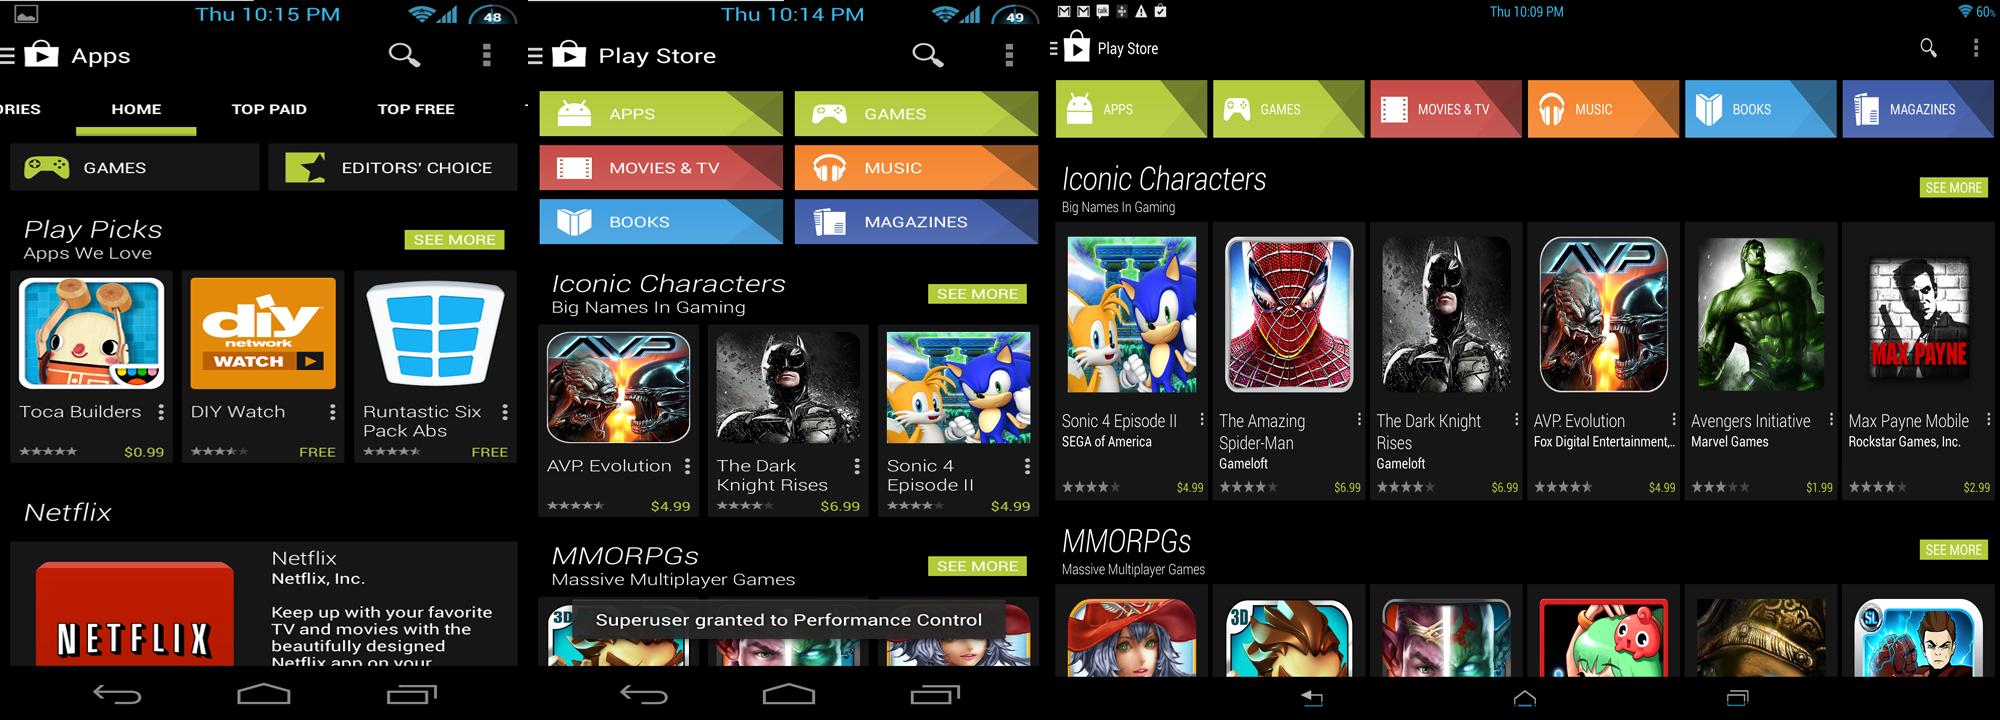 google play store app apk download